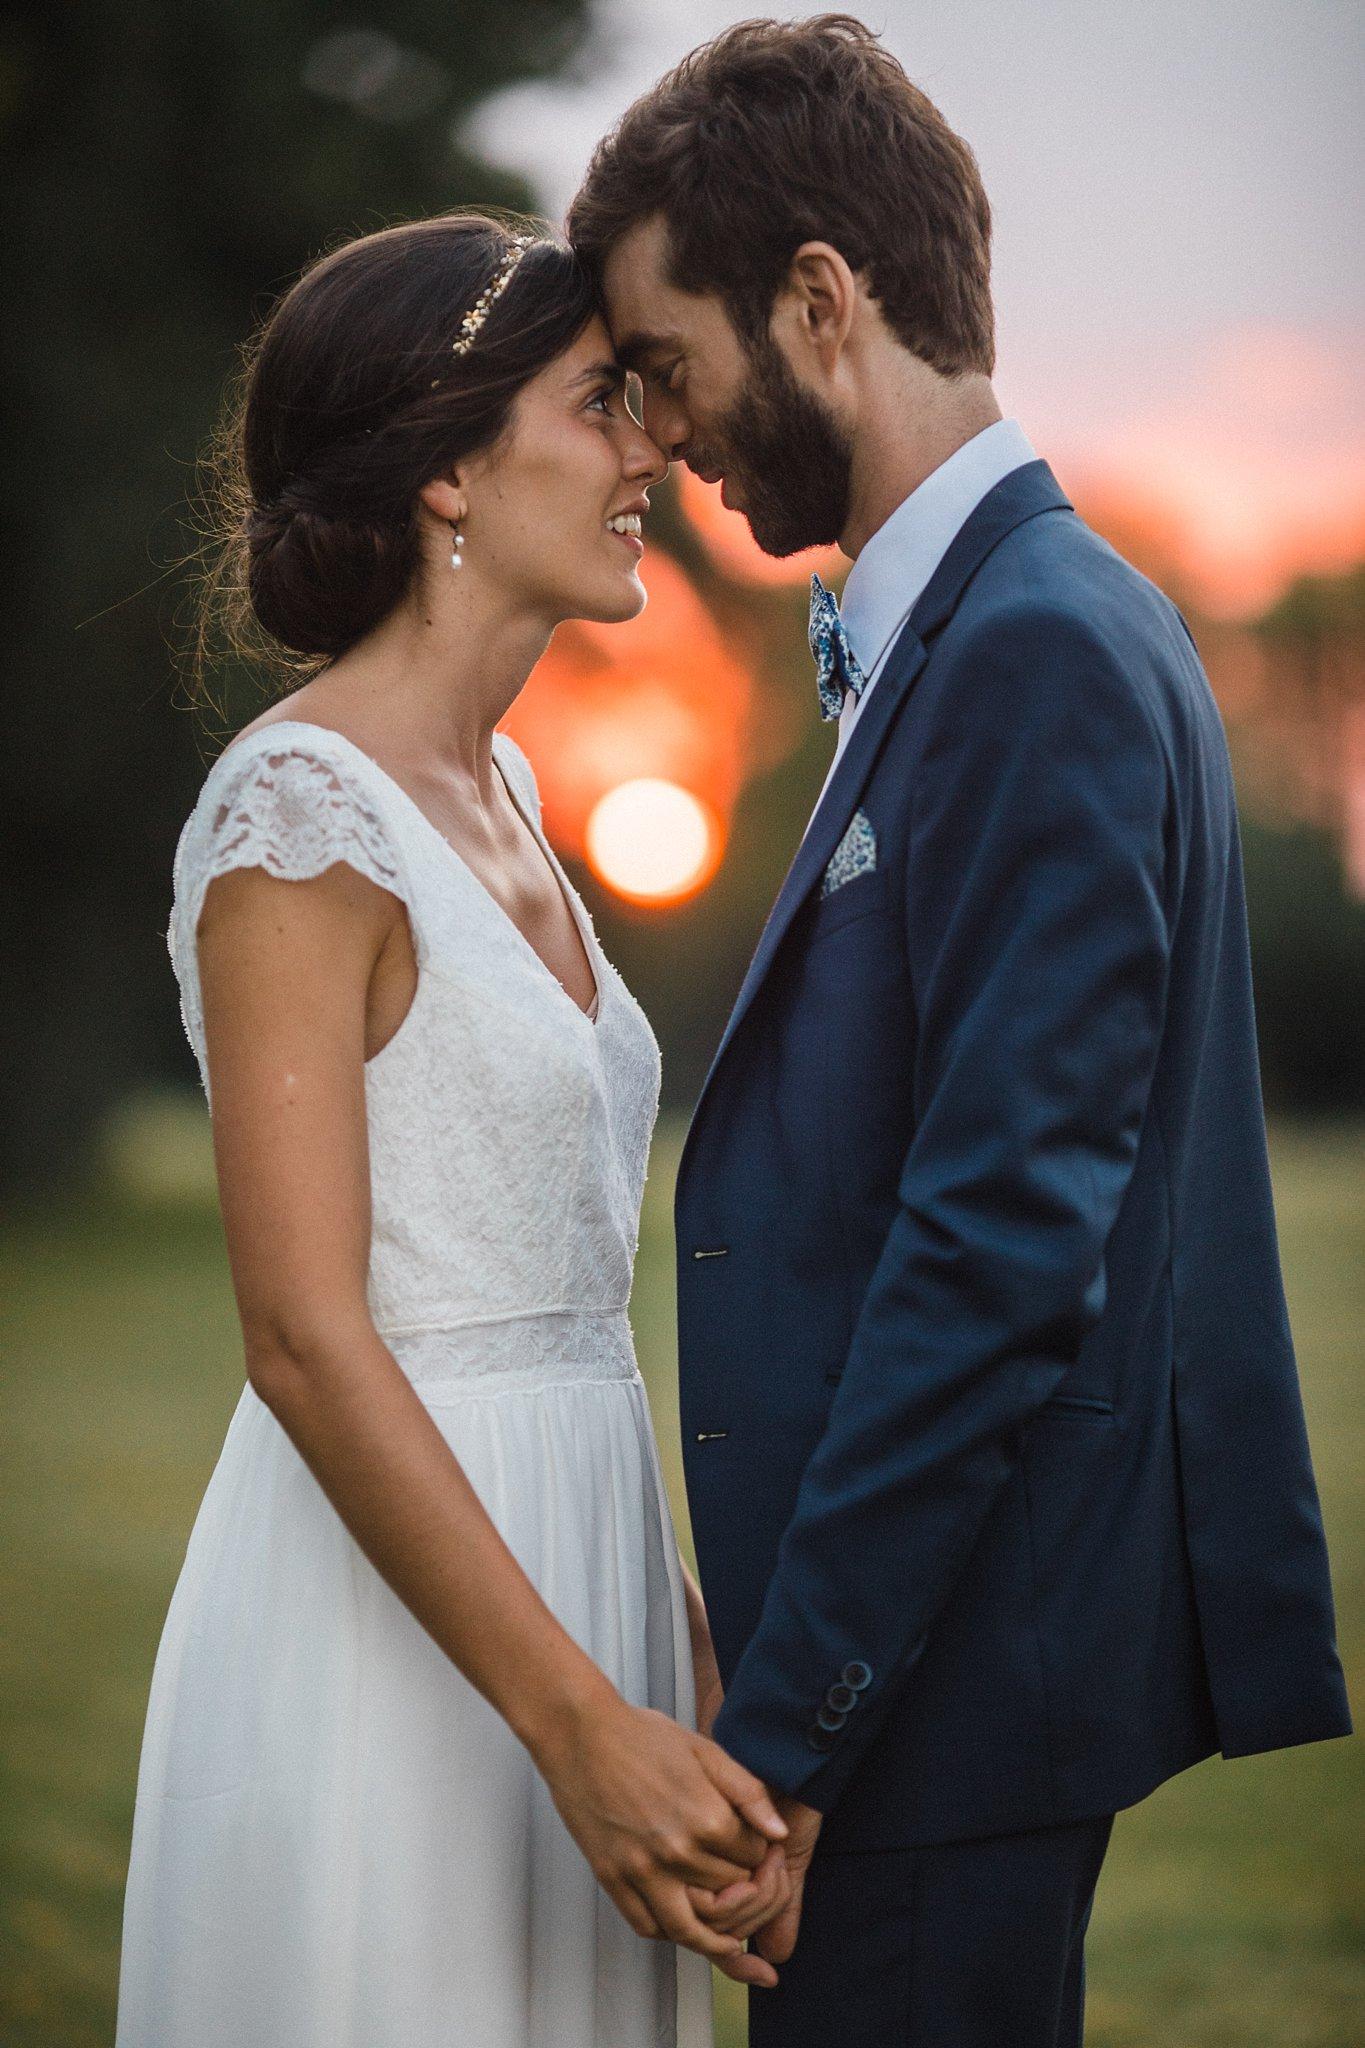 Mariage-a-la-maison-secall-hugo-hennequin-photographe-mariage-perpignan_0101.jpg